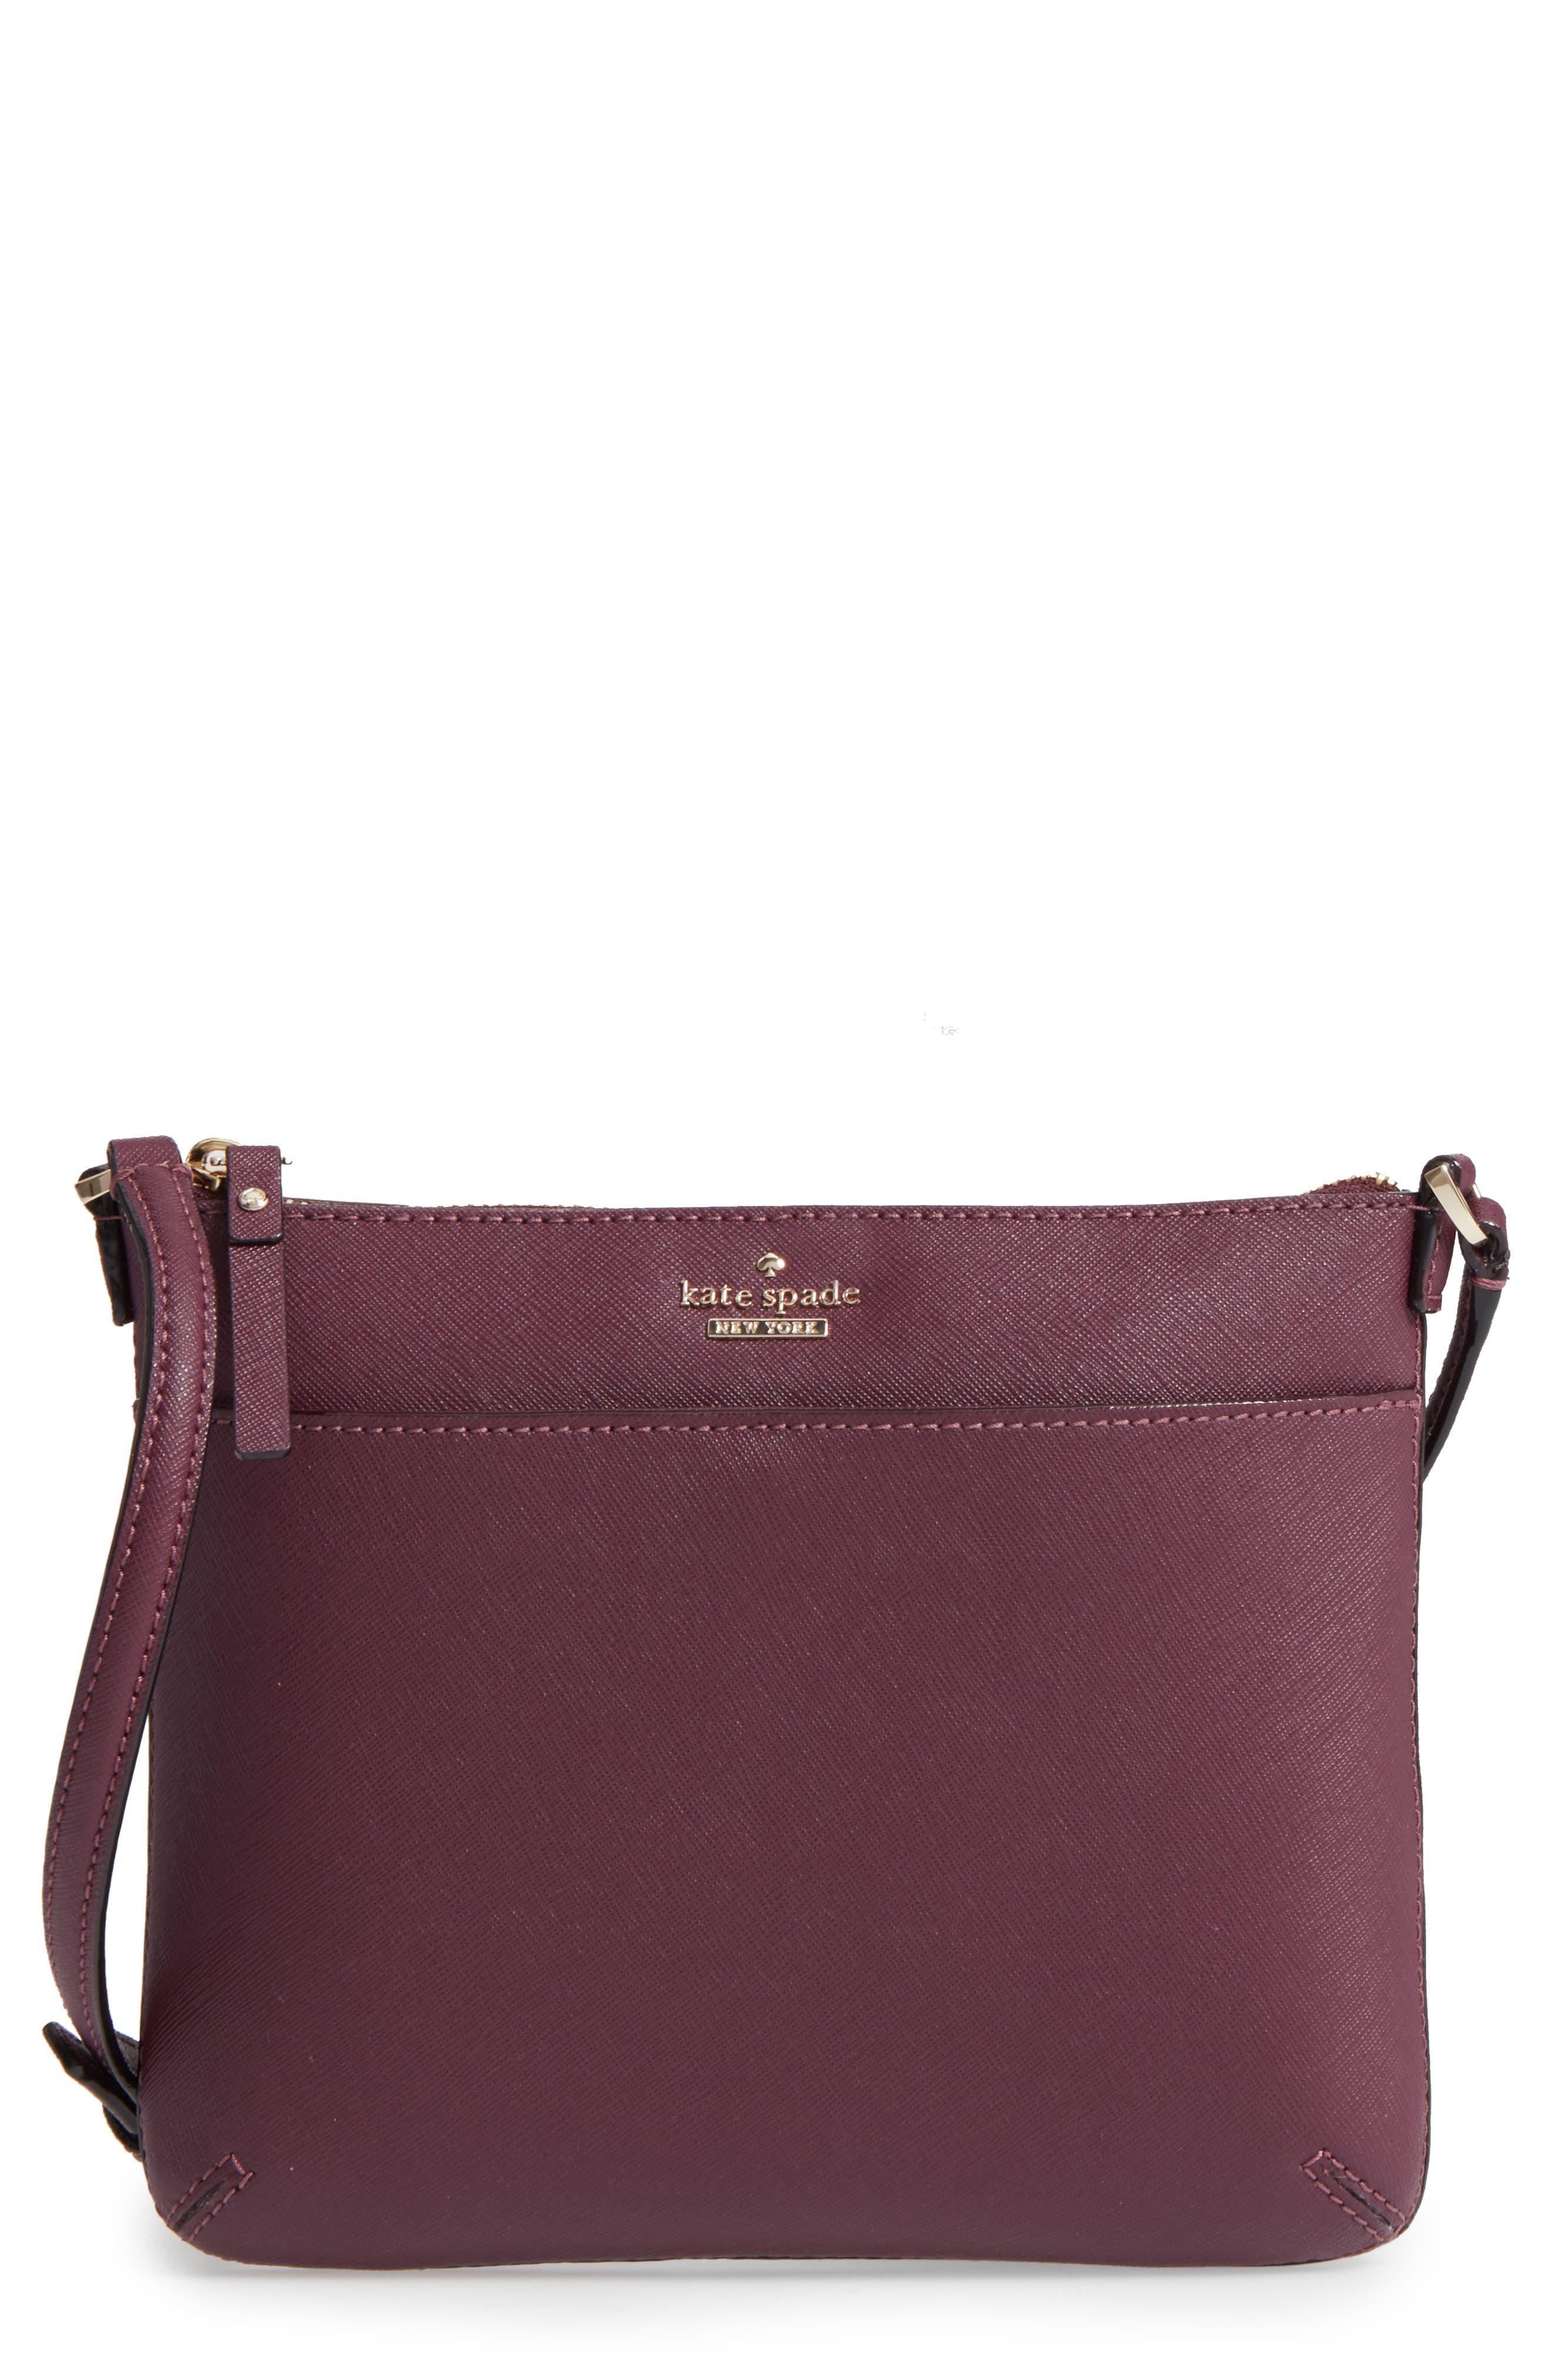 kate spade new york cameron street - tenley leather crossbody bag